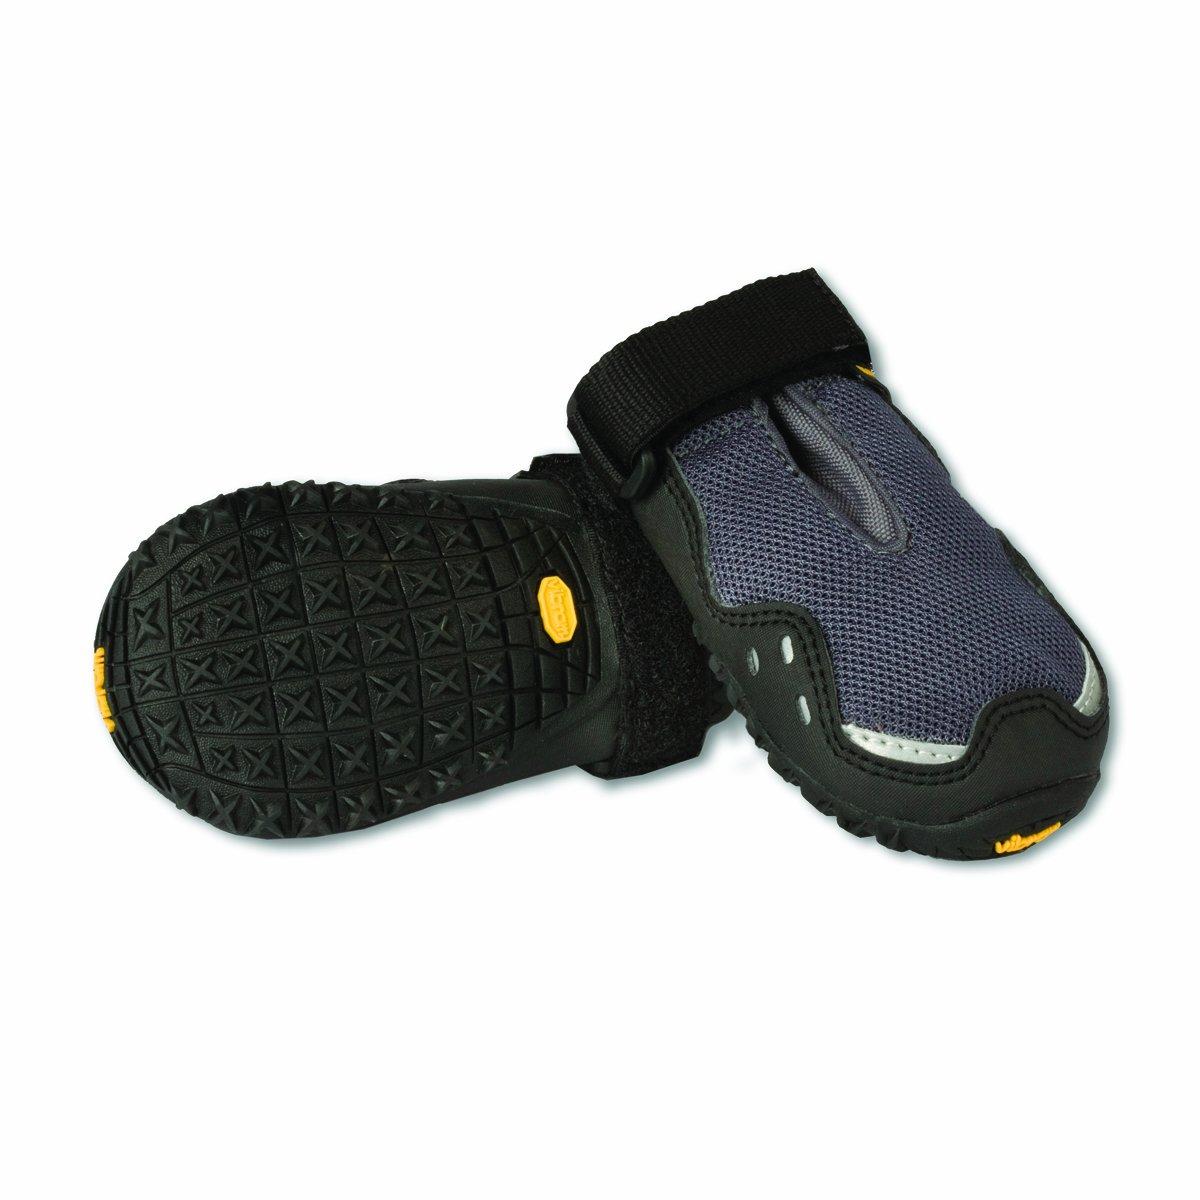 Ruffwear Grip Trex Boots for Dogs, 2.0-Inch, Granite Gray